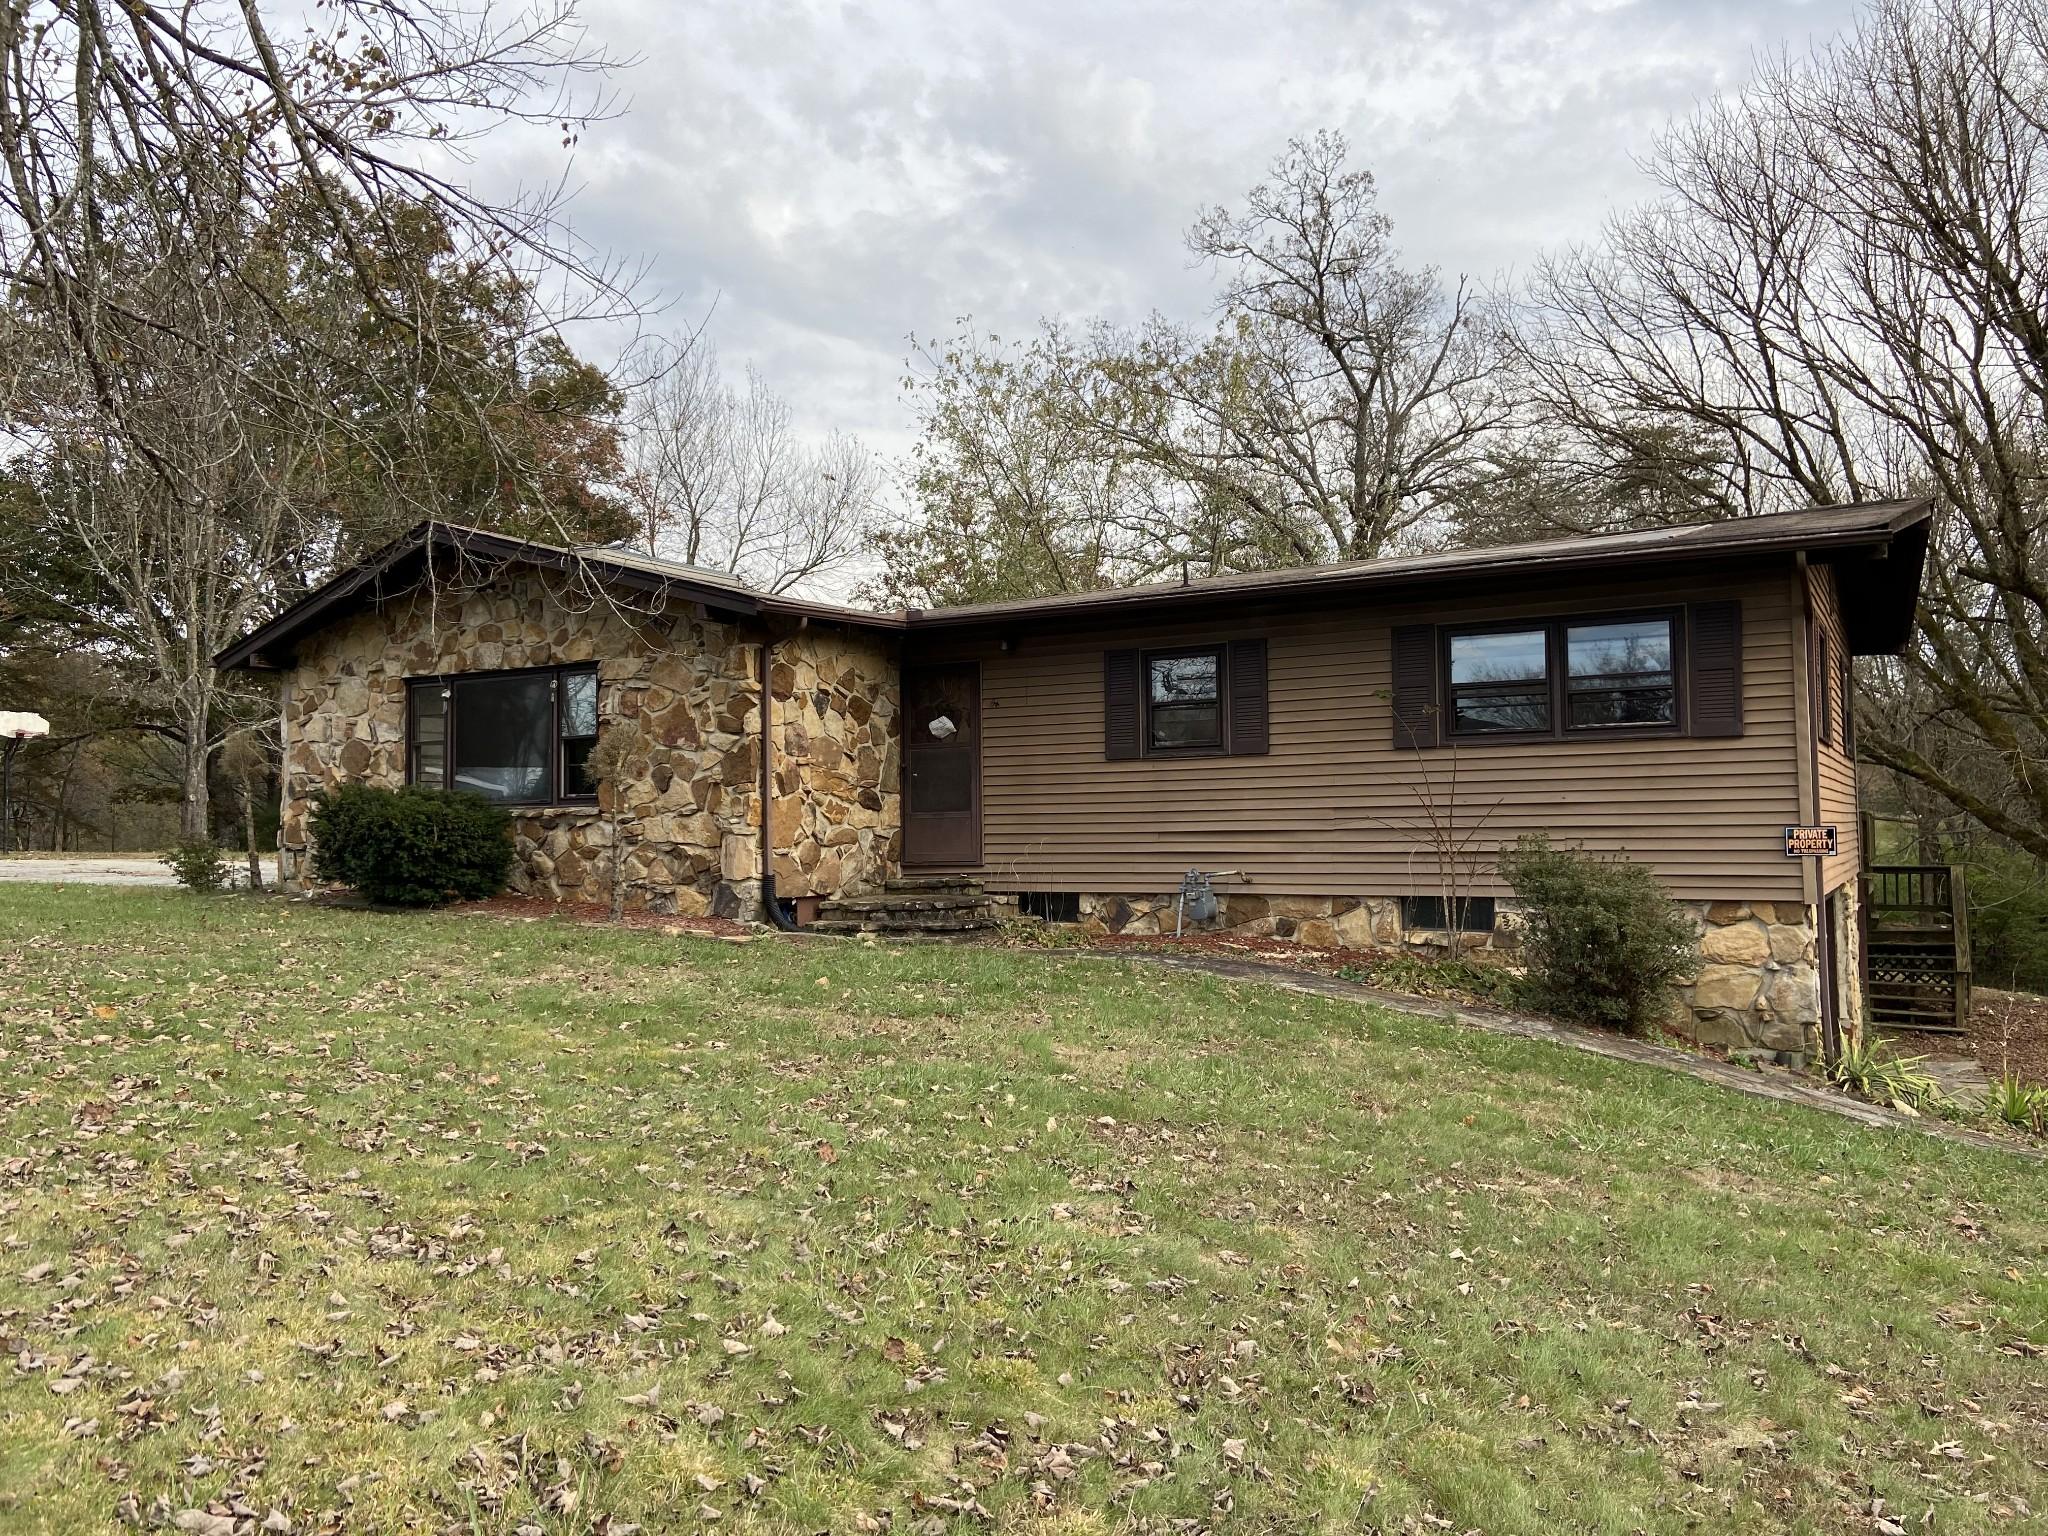 64 Buena Vista Dr, Crossville, TN 38555 - Crossville, TN real estate listing